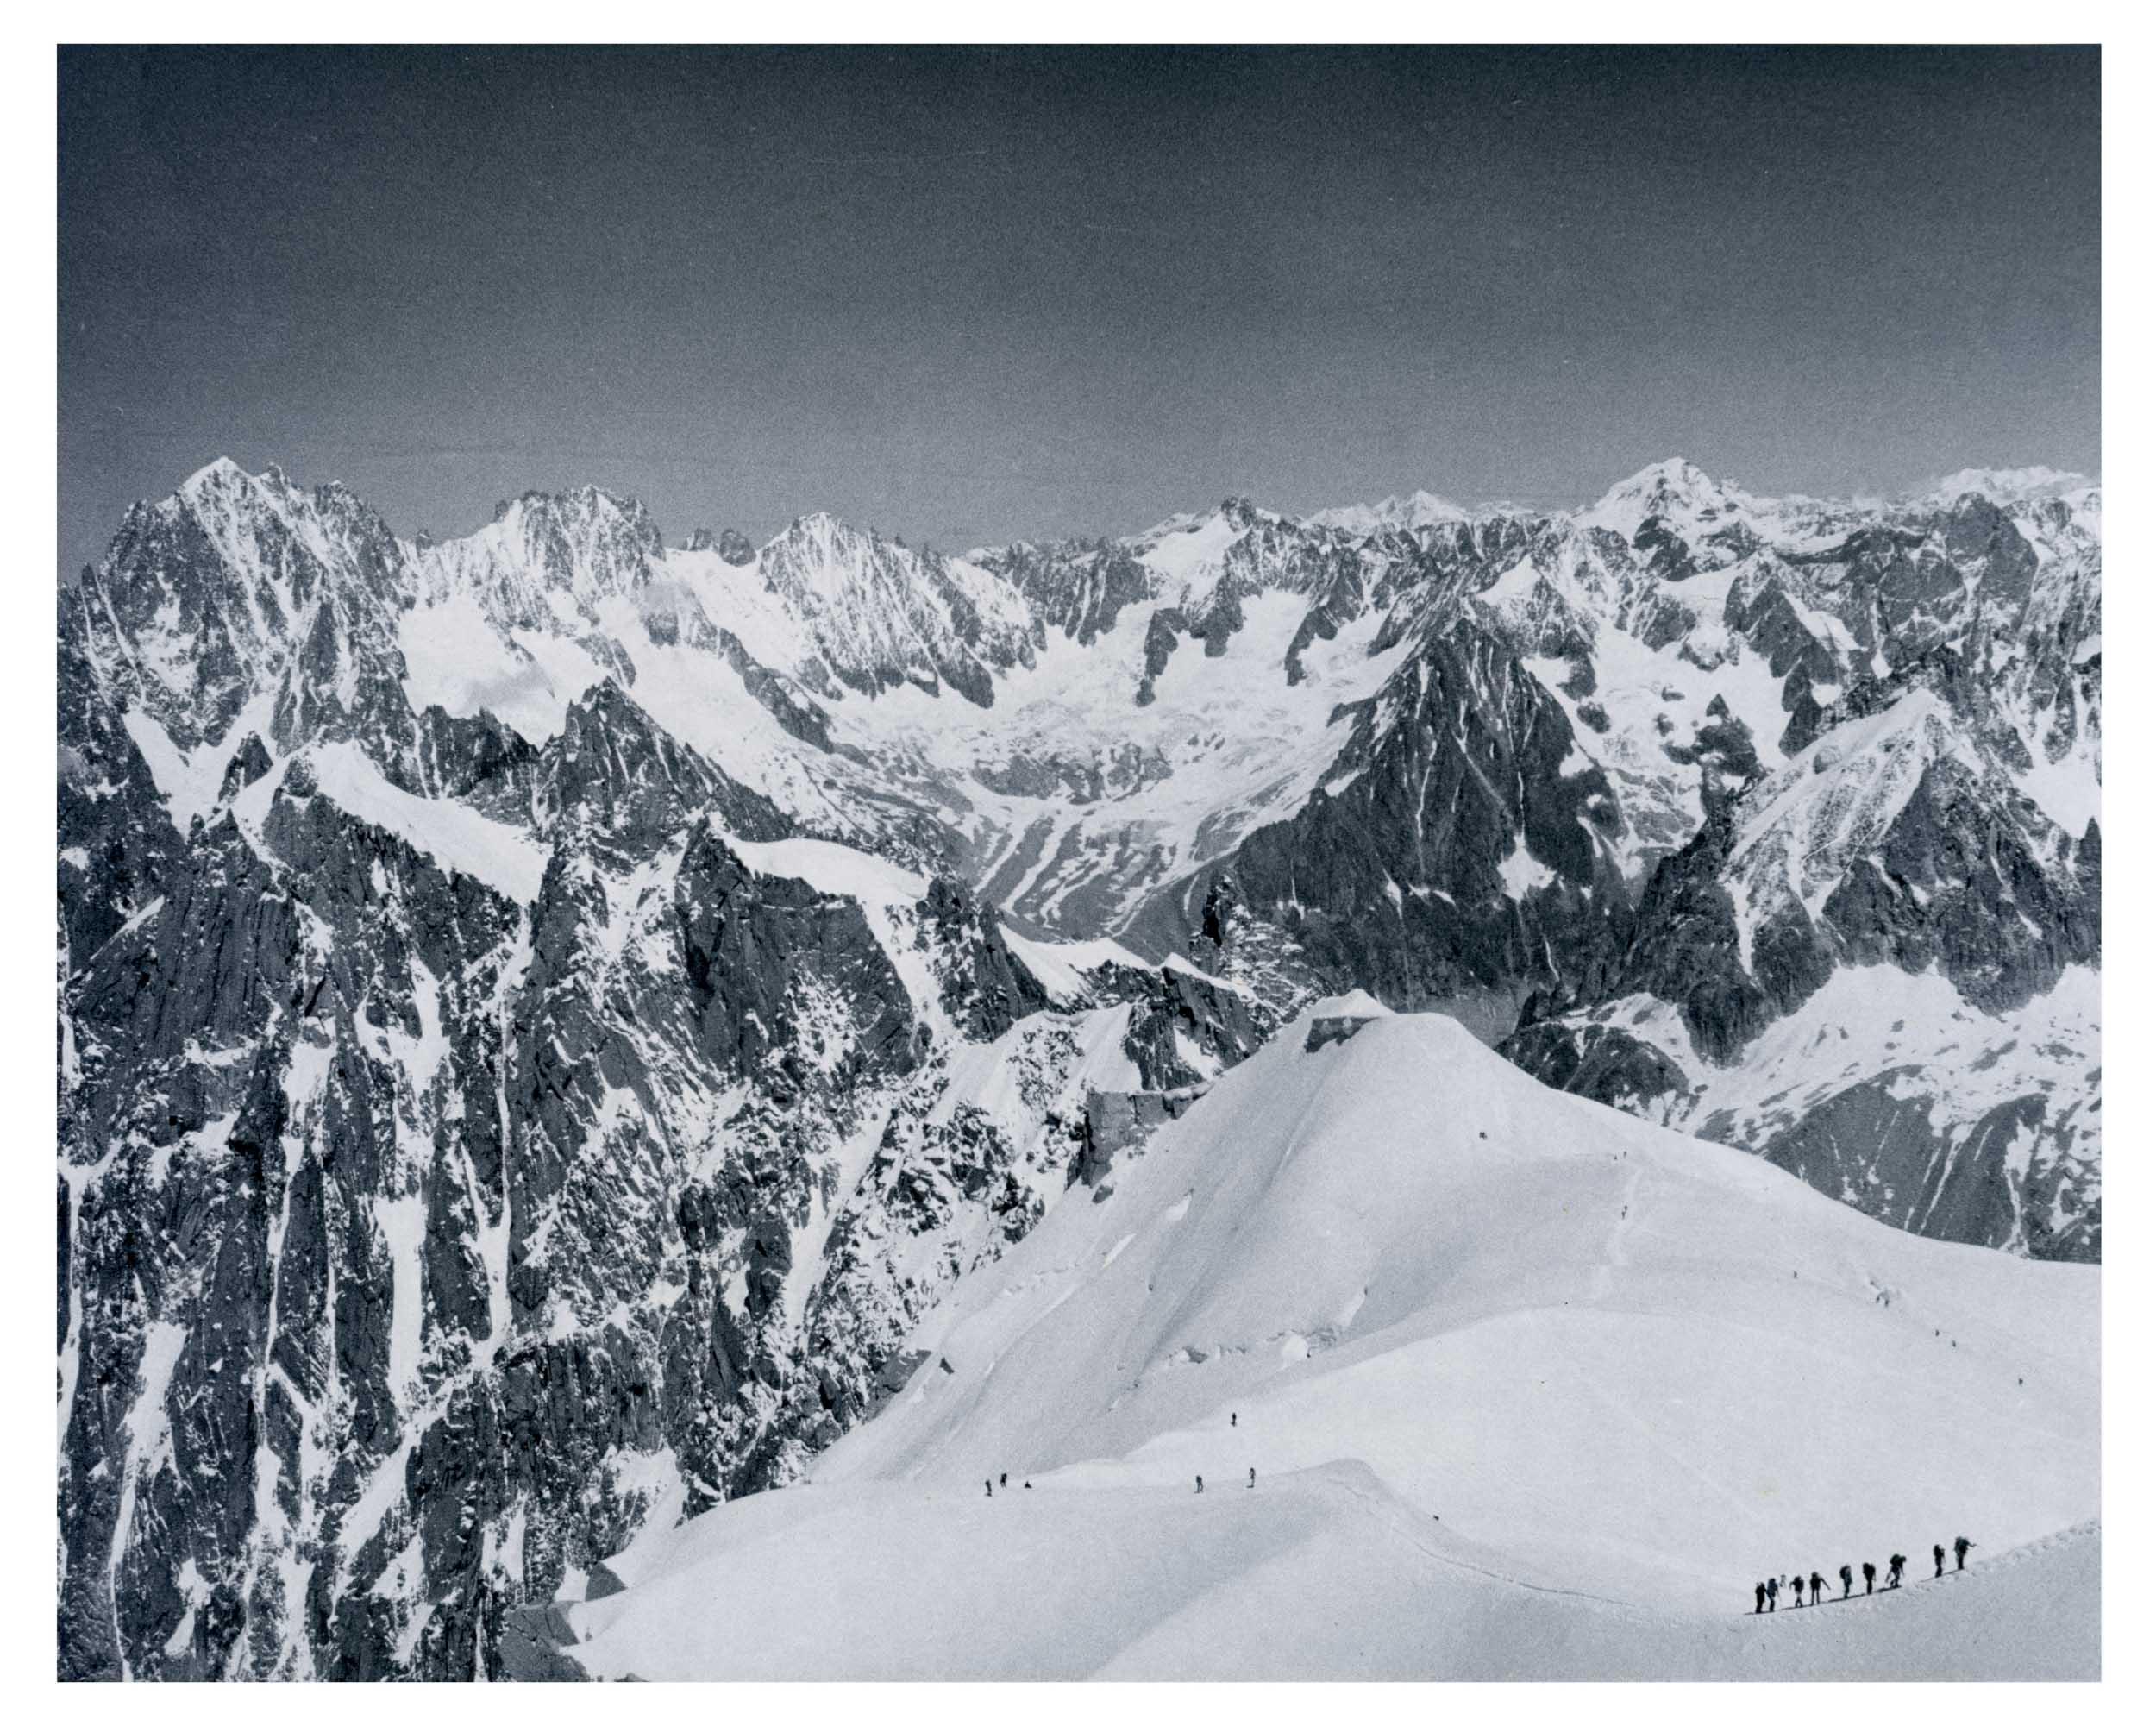 La Vallée Blanche,<br>Chamonix